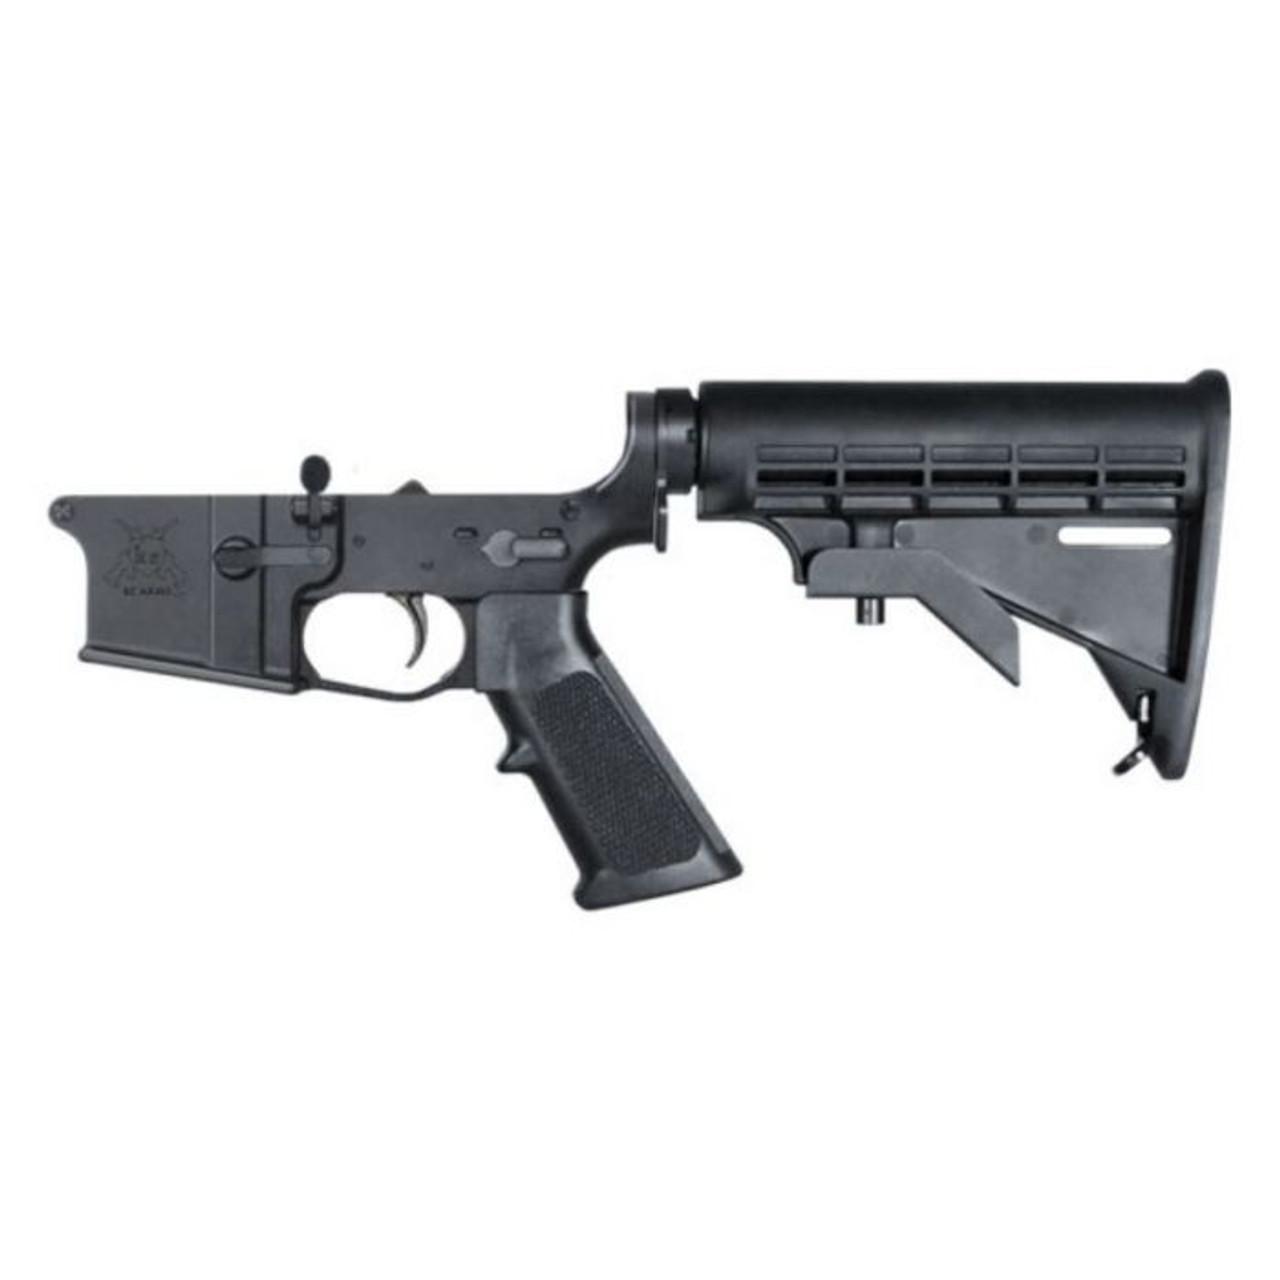 KE Arms KE15 Billet Complete Lower Receiver CALIFORNIA LEGAL - .223/5.56